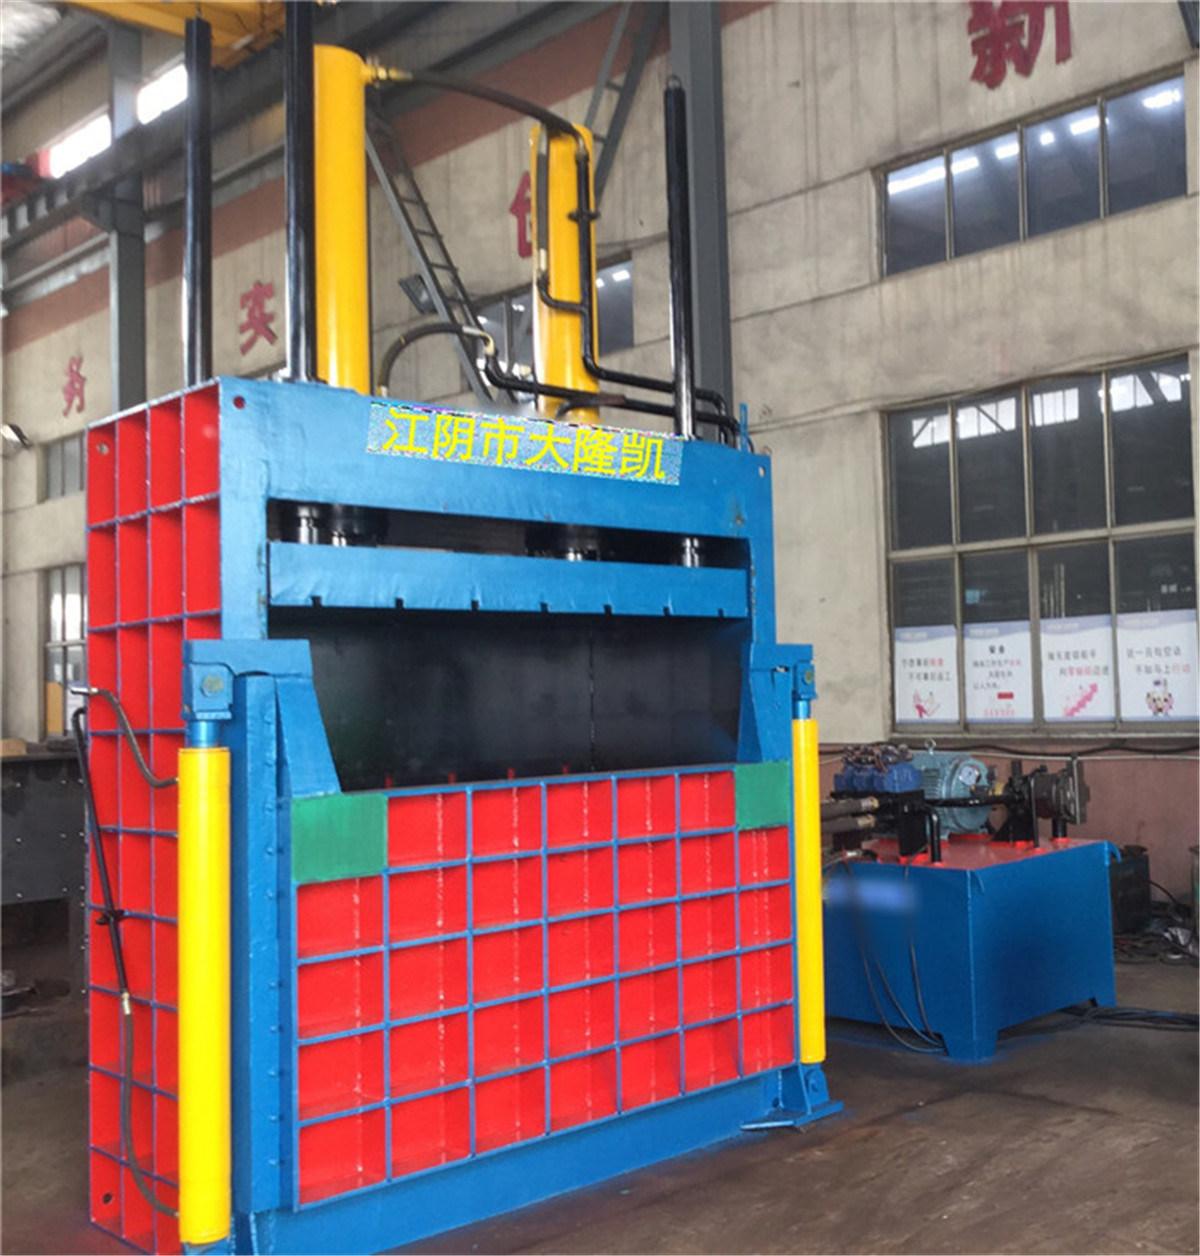 Y82-160 Plastic Vertical Packing Machine